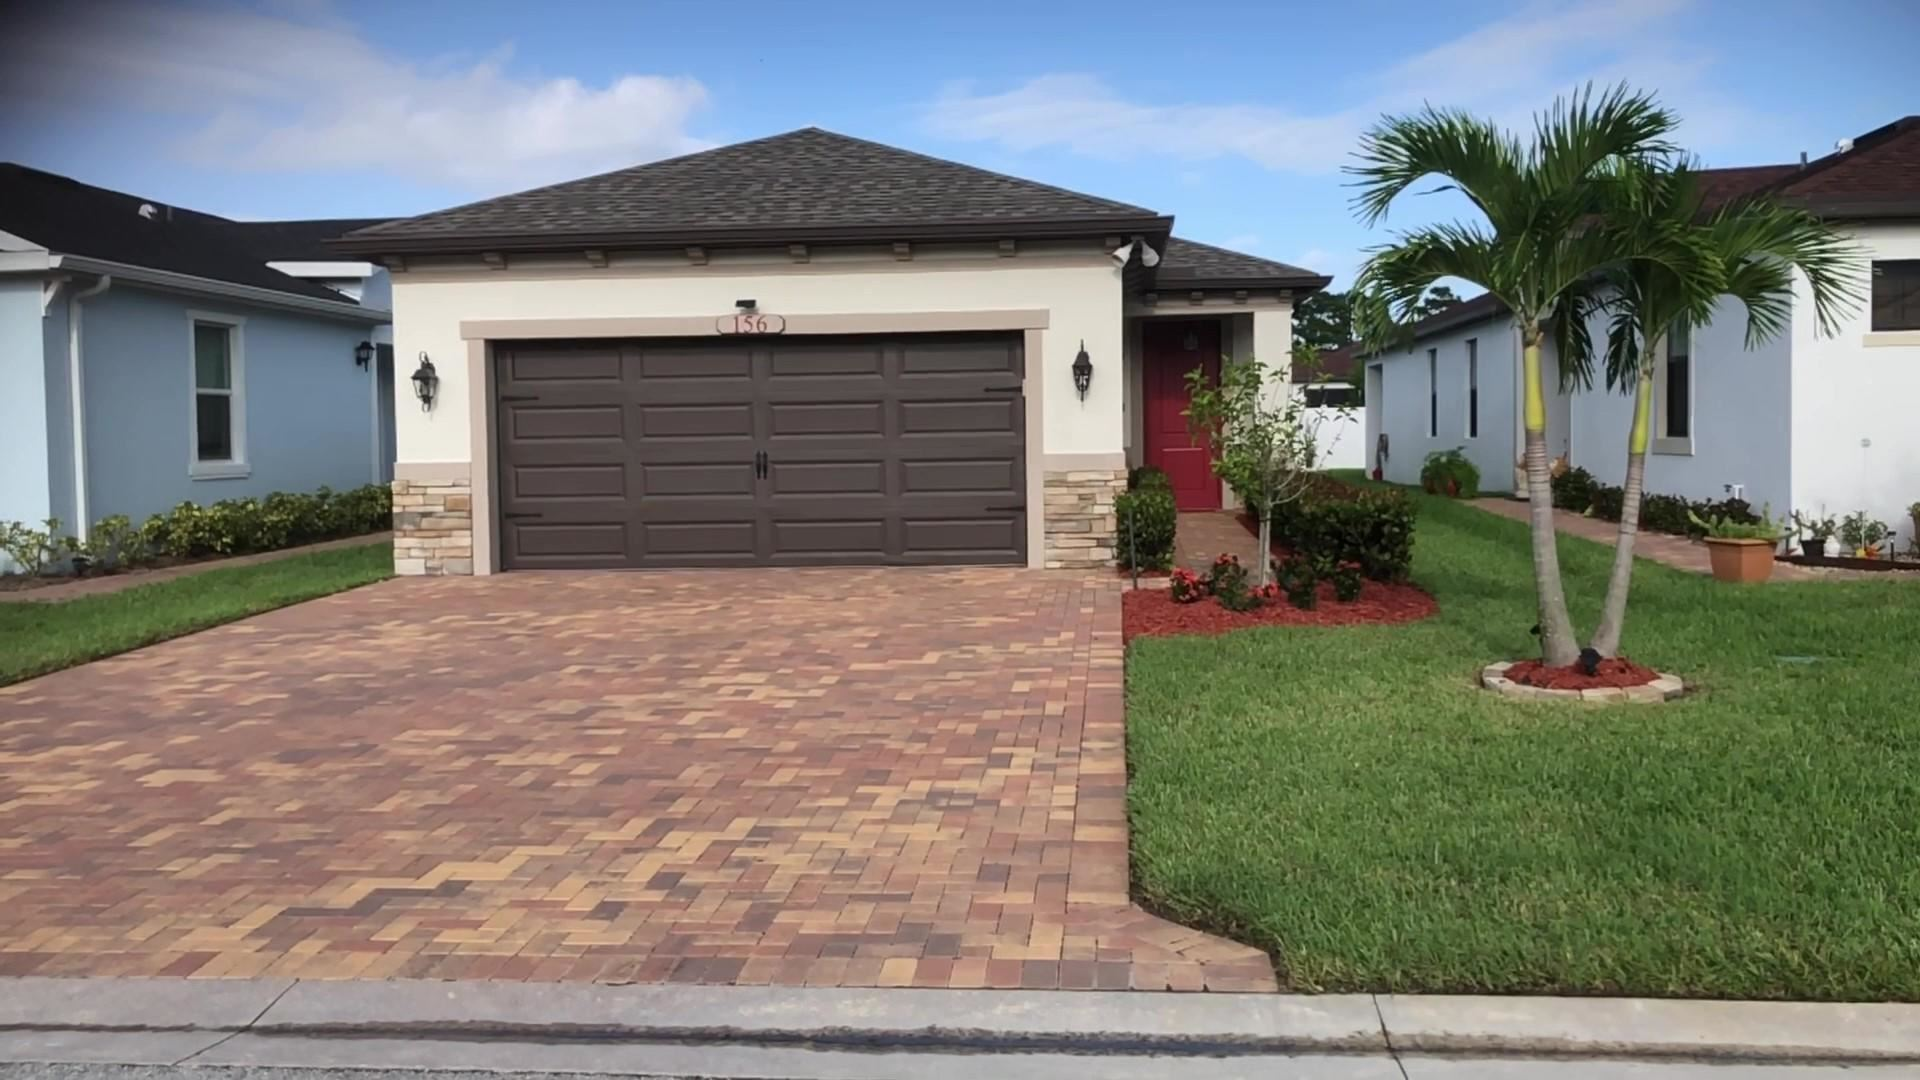 156 SE Via Visconti, Port Saint Lucie, FL 34952 - #: RX-10669378